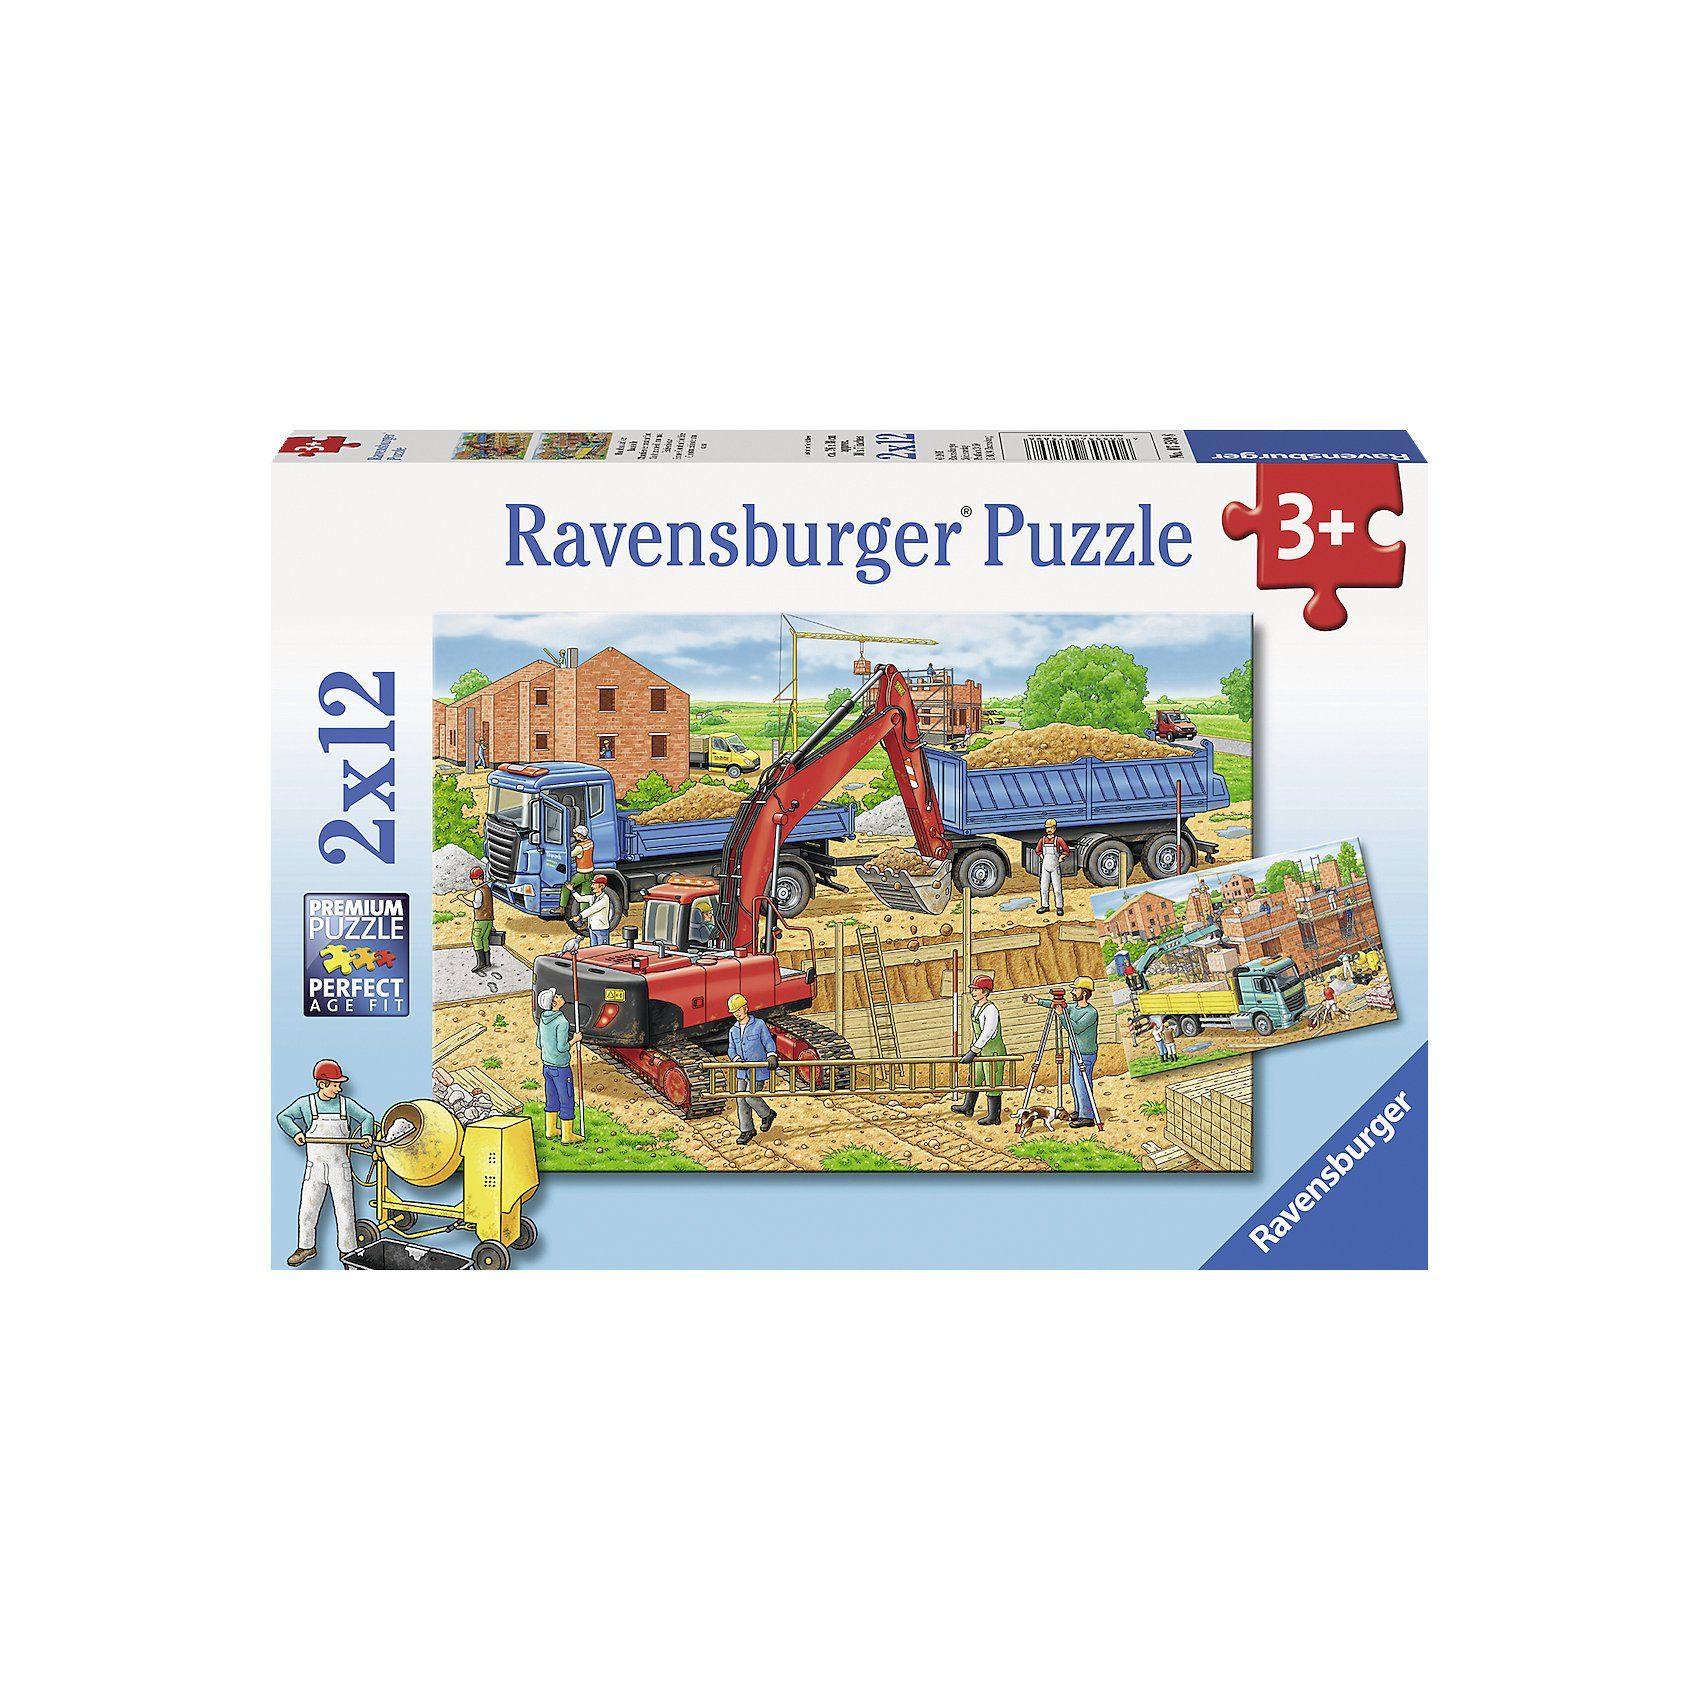 Ravensburger Puzzle Hausbau auf der Baustelle 2 x 12 Teile